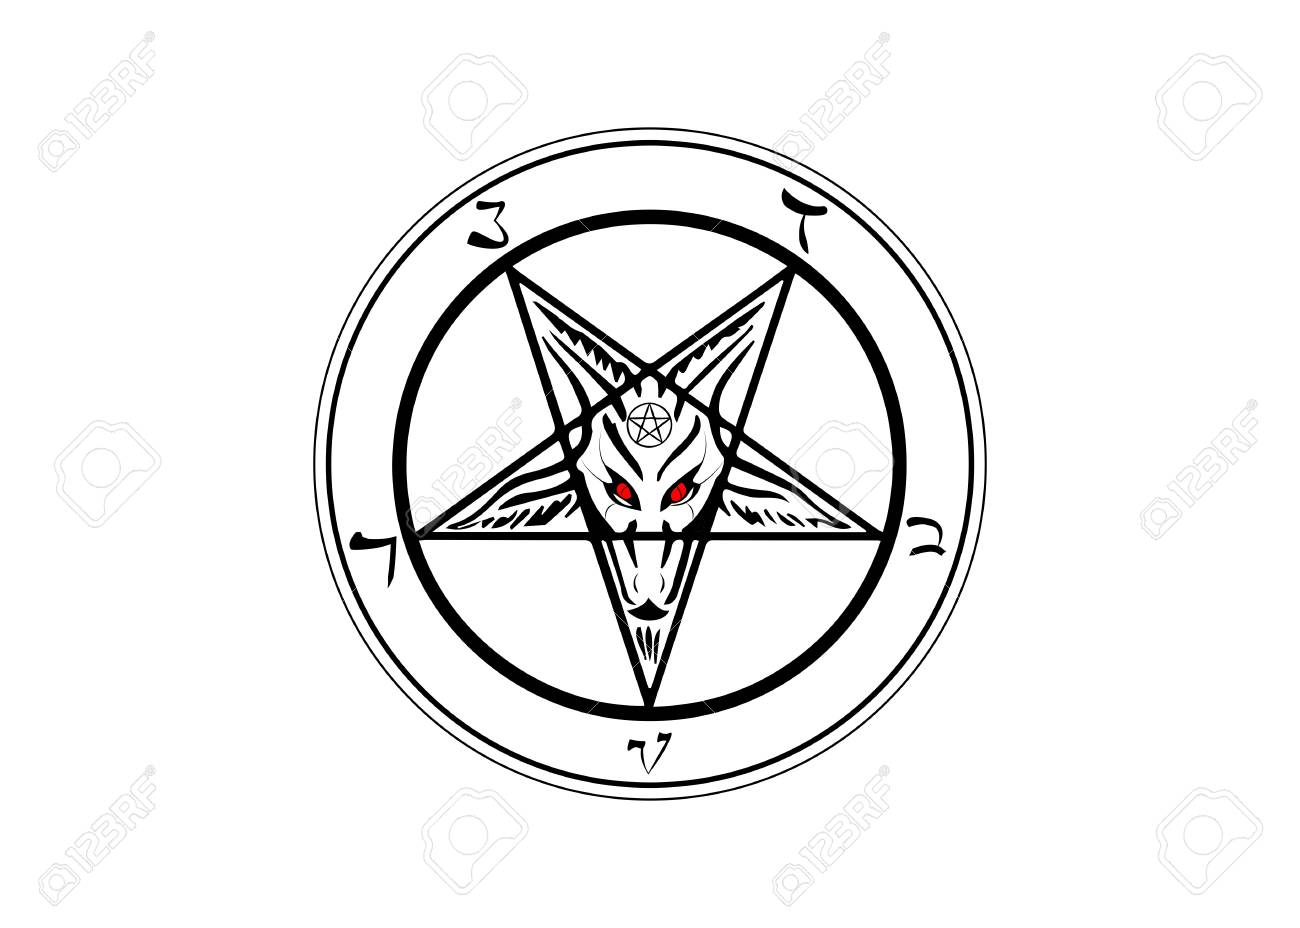 The Sigil of Baphomet original Goat Pentagram, vector isolated